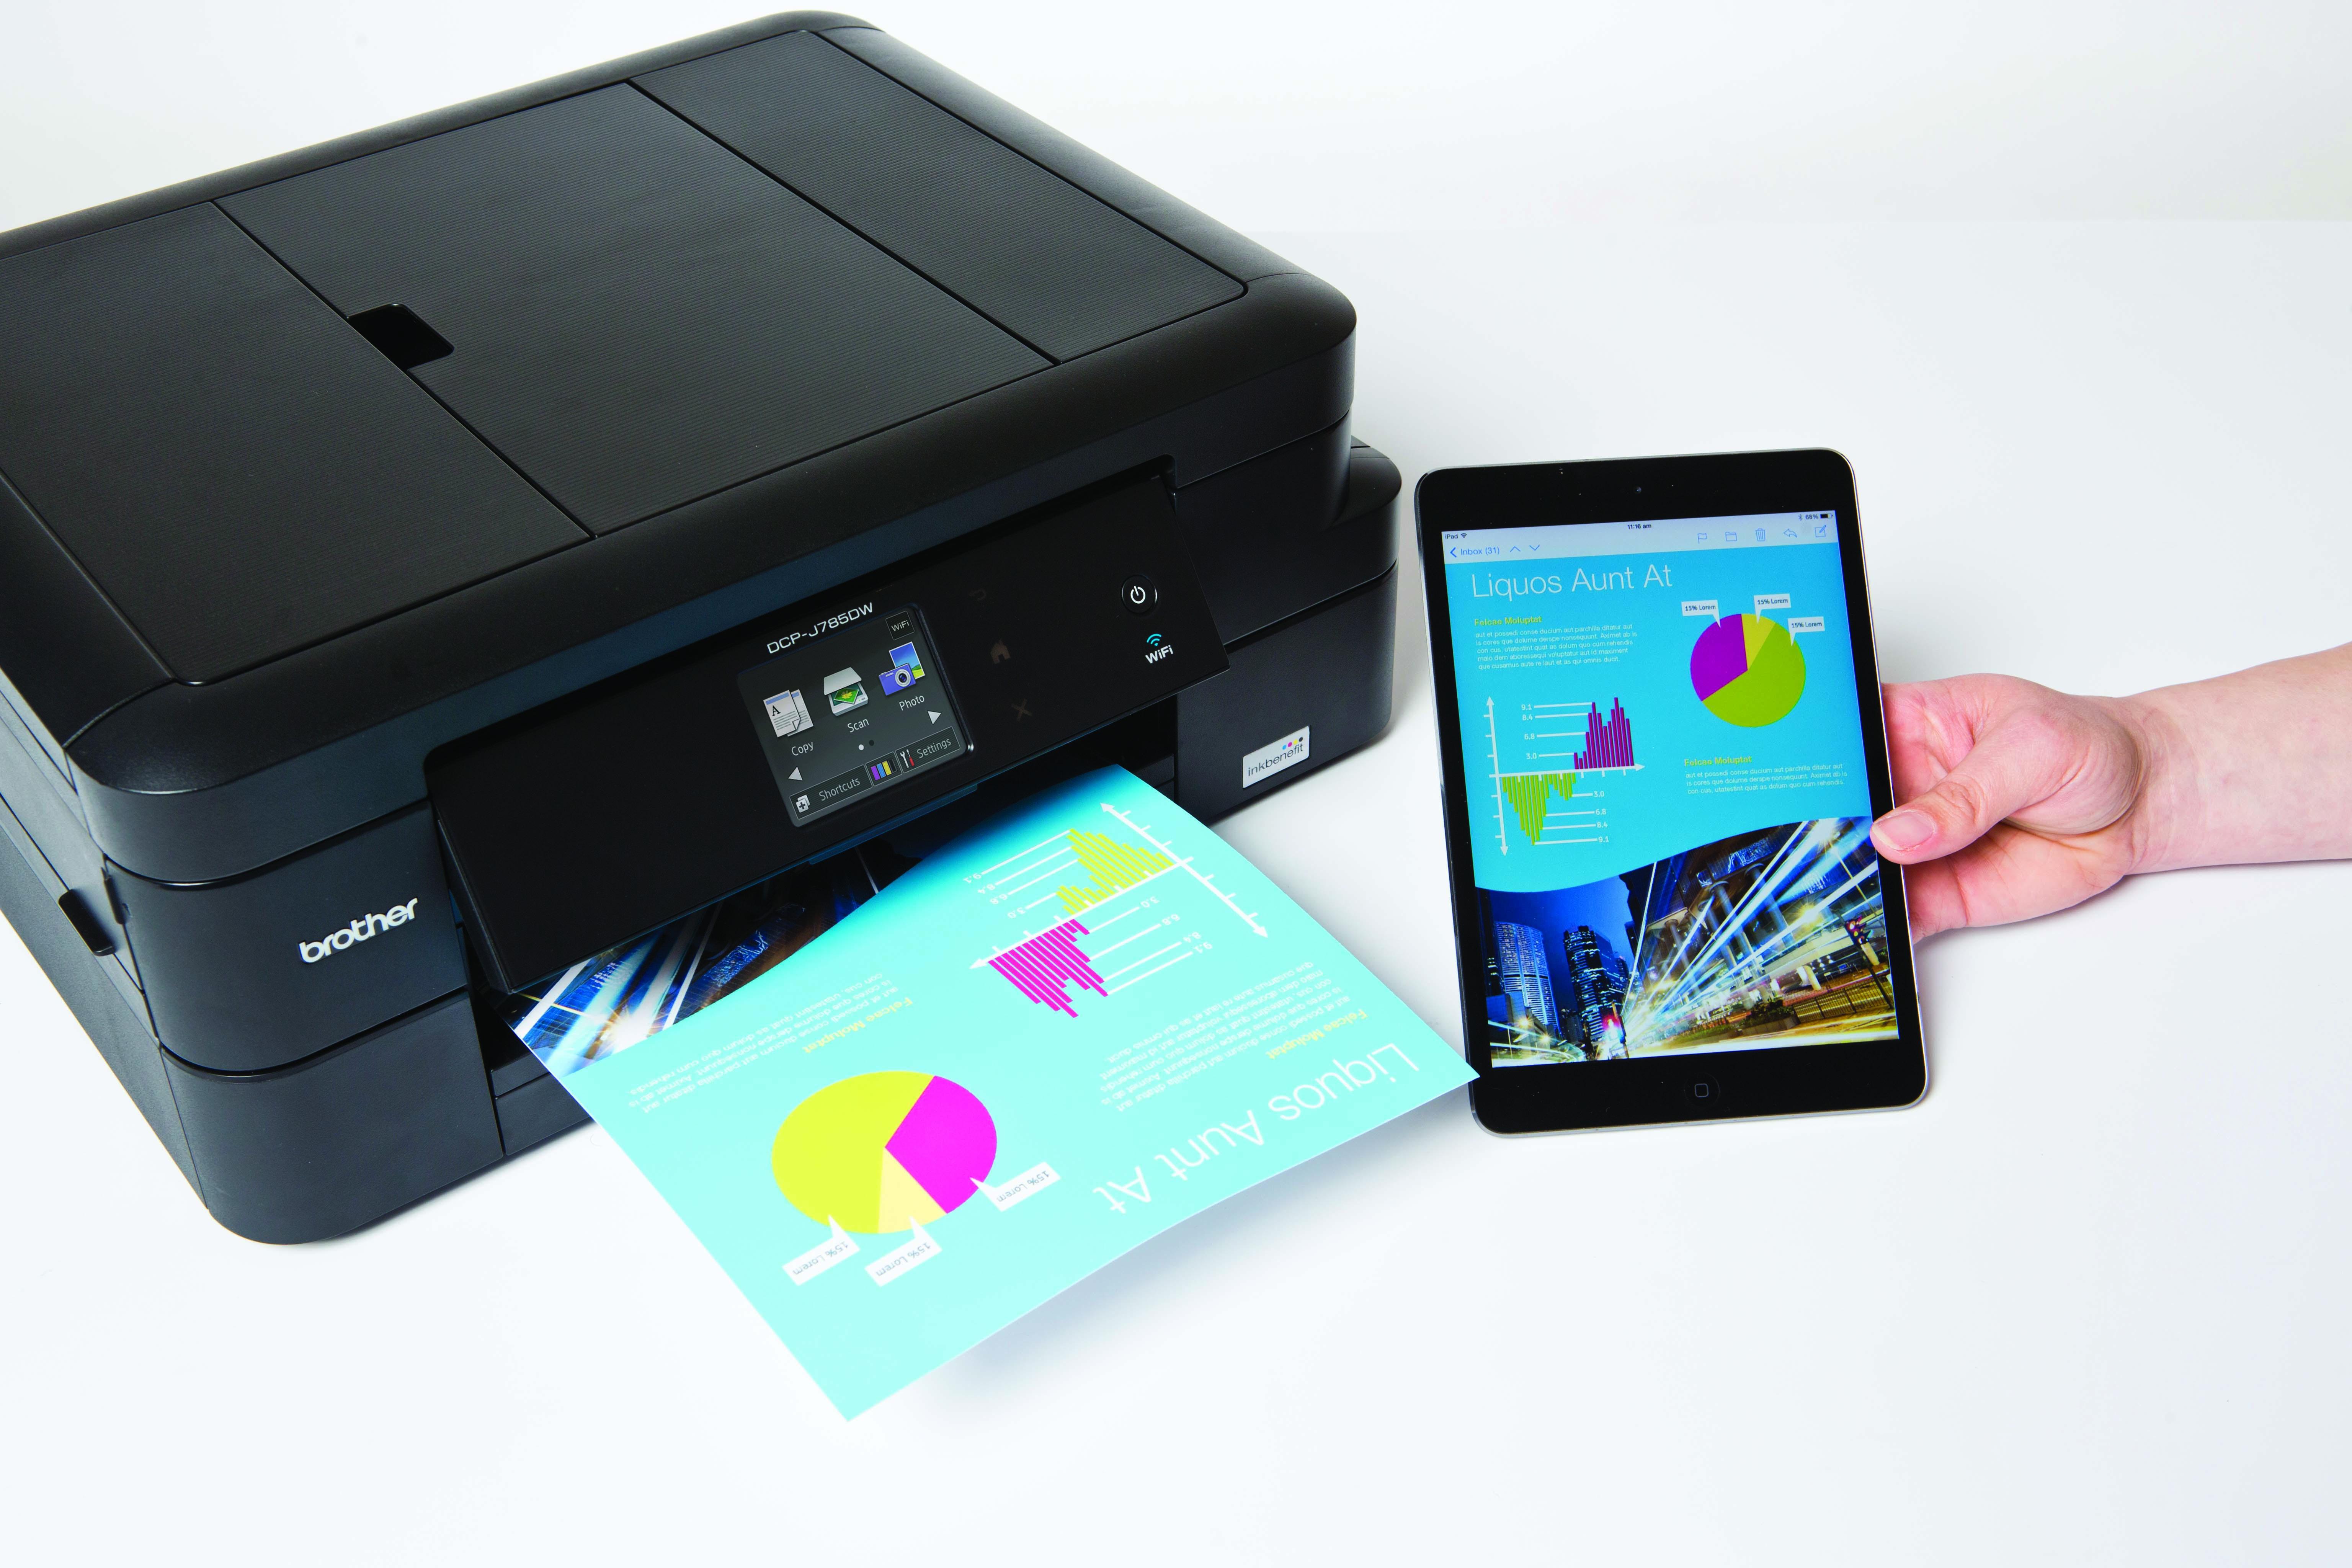 DCP-J785W mobile printing